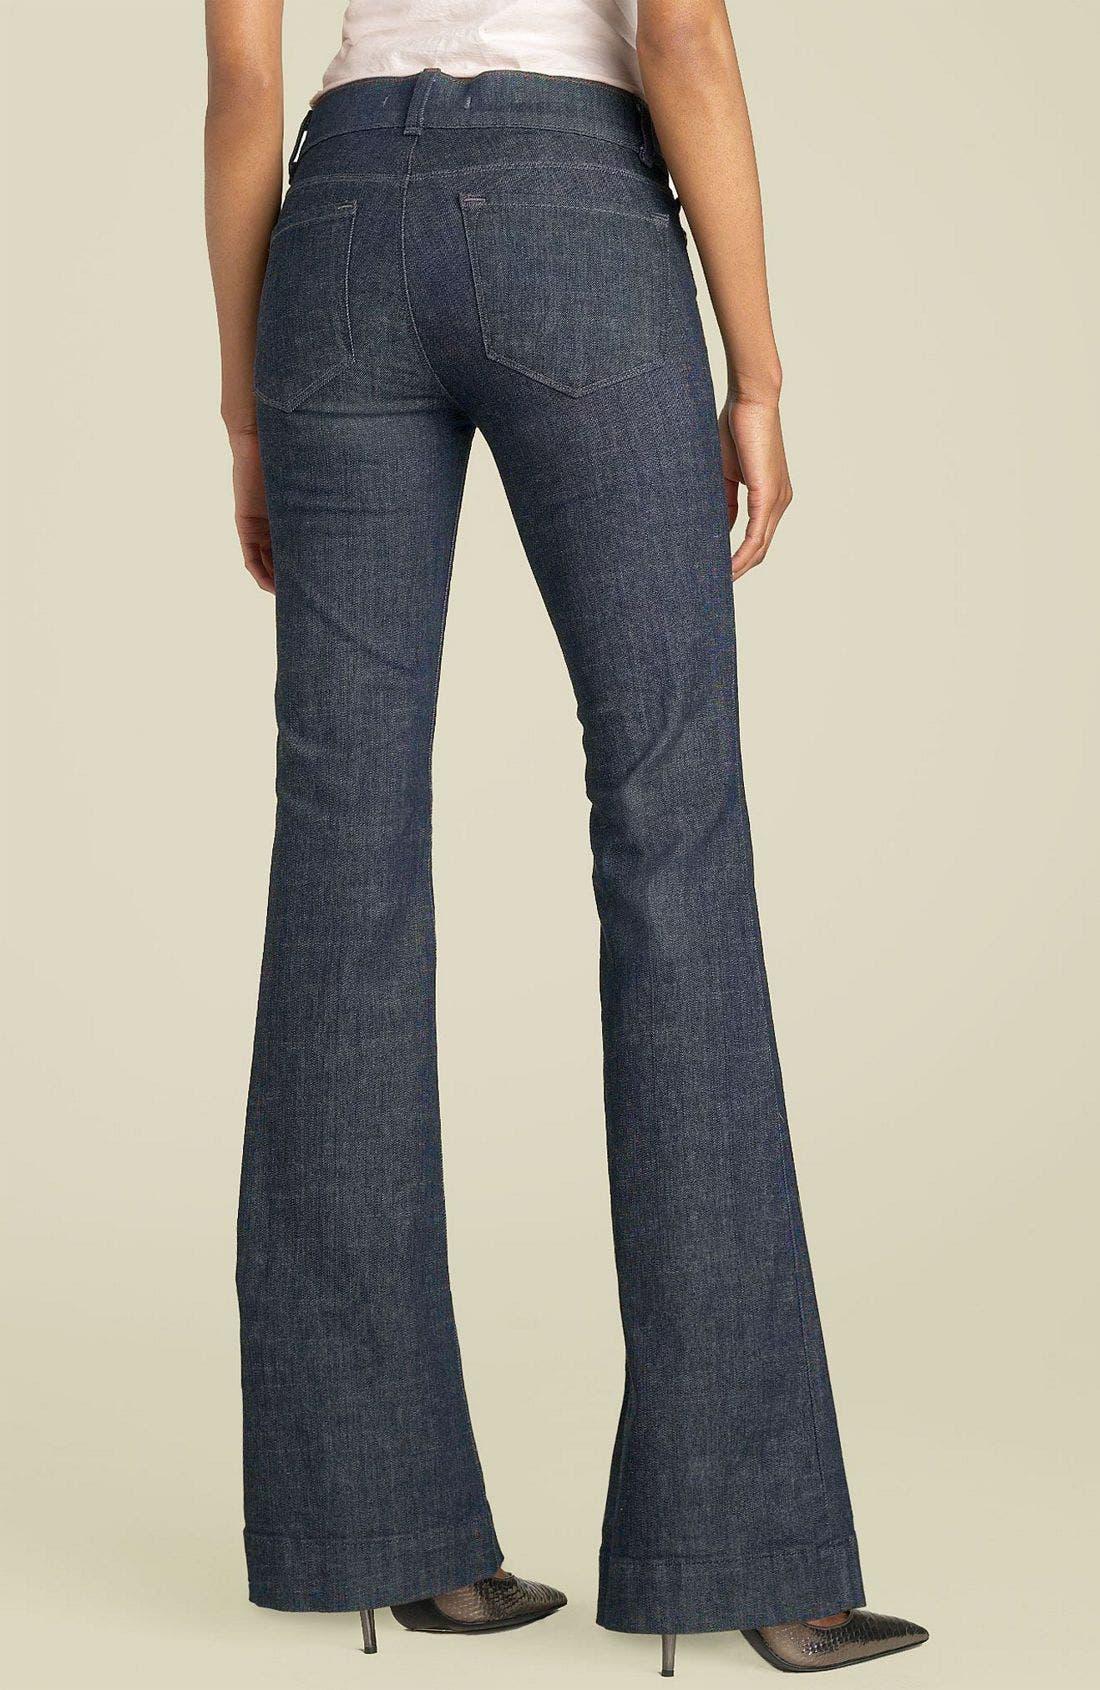 Main Image - J Brand 'Lovestory' Low Rise Bell Bottom Stretch Jeans (Miner)